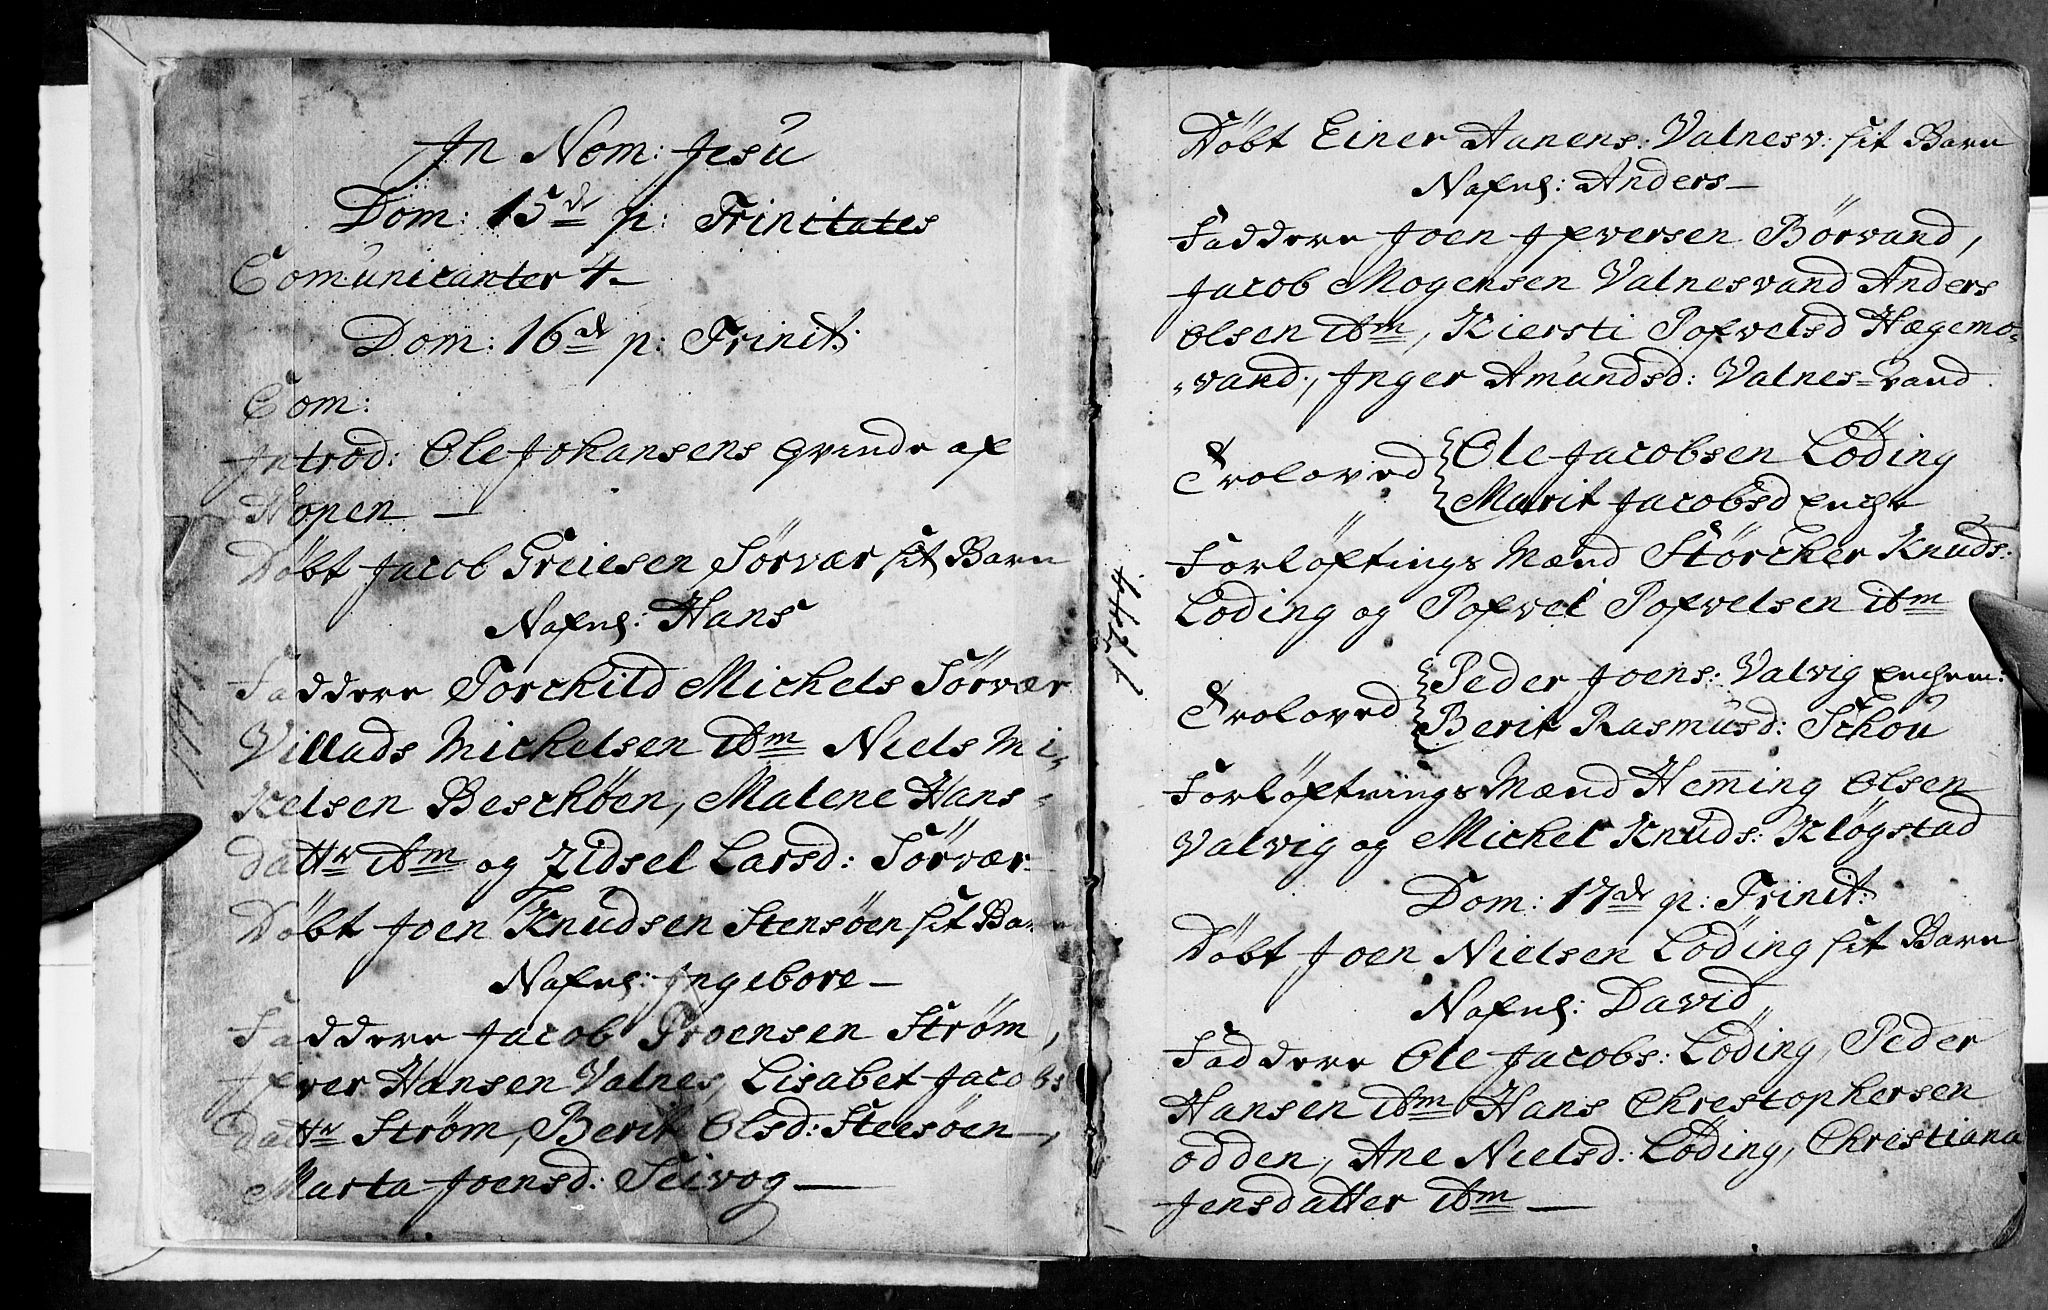 SAT, Ministerialprotokoller, klokkerbøker og fødselsregistre - Nordland, 801/L0002: Ministerialbok nr. 801A02, 1744-1761